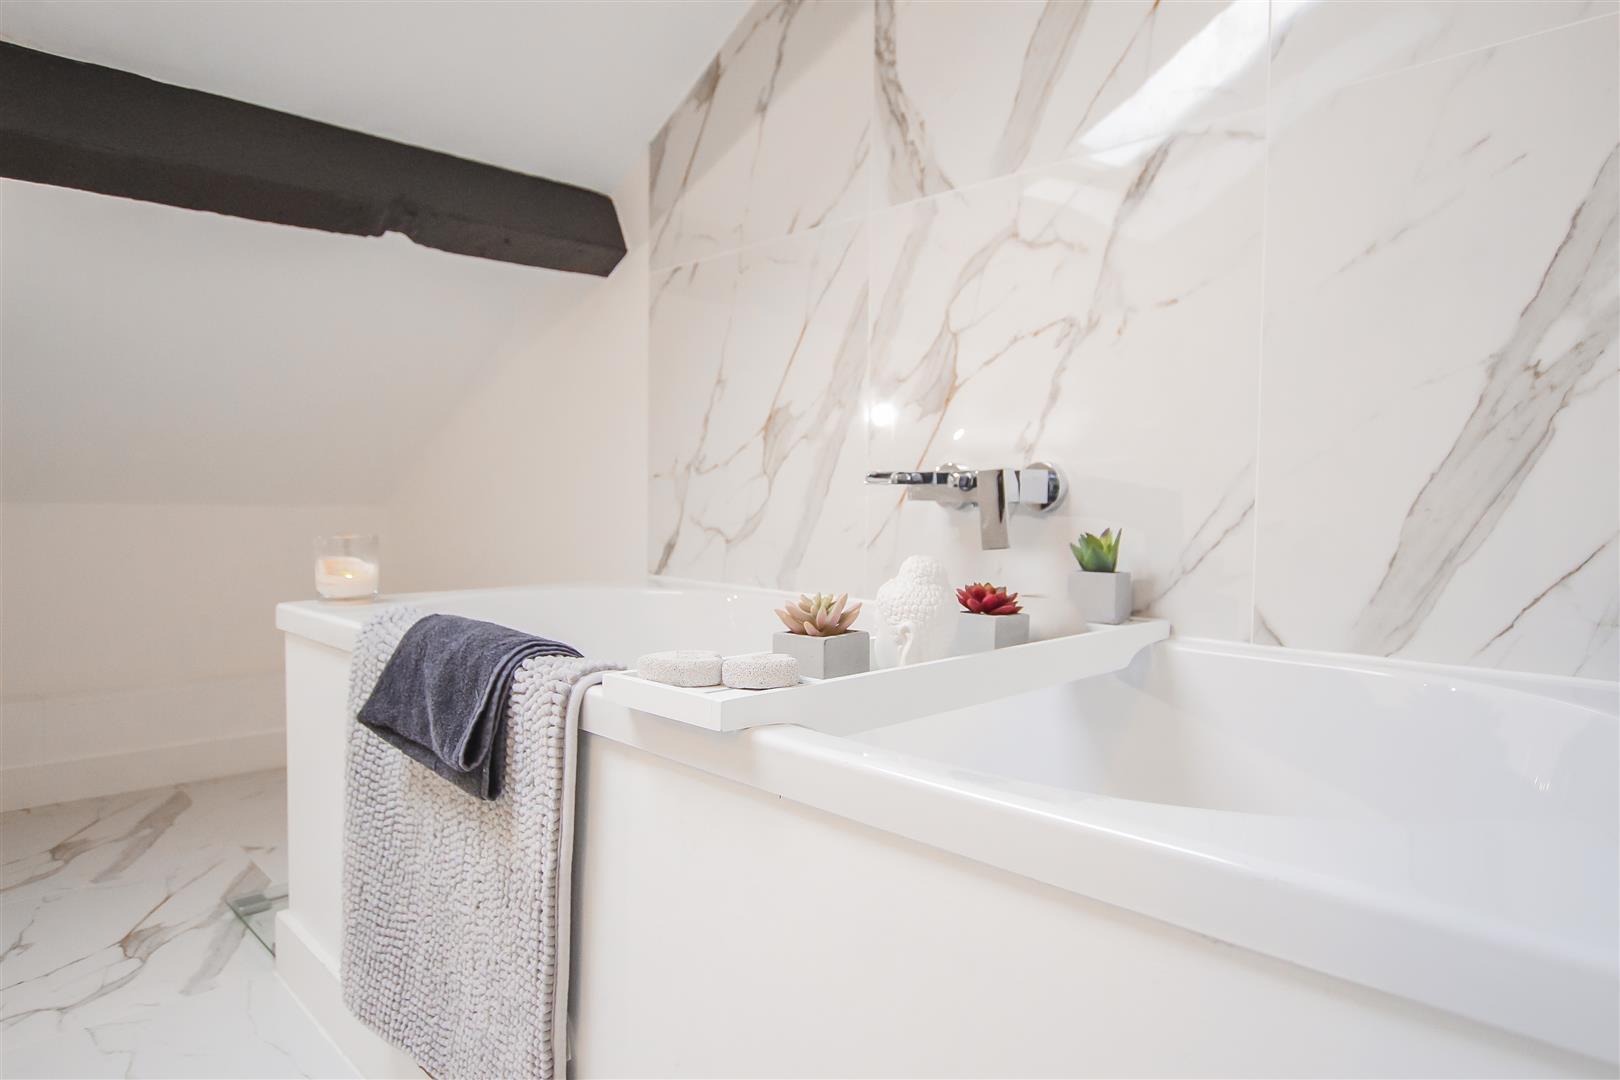 3 Bedroom Duplex Apartment For Sale - Image 48